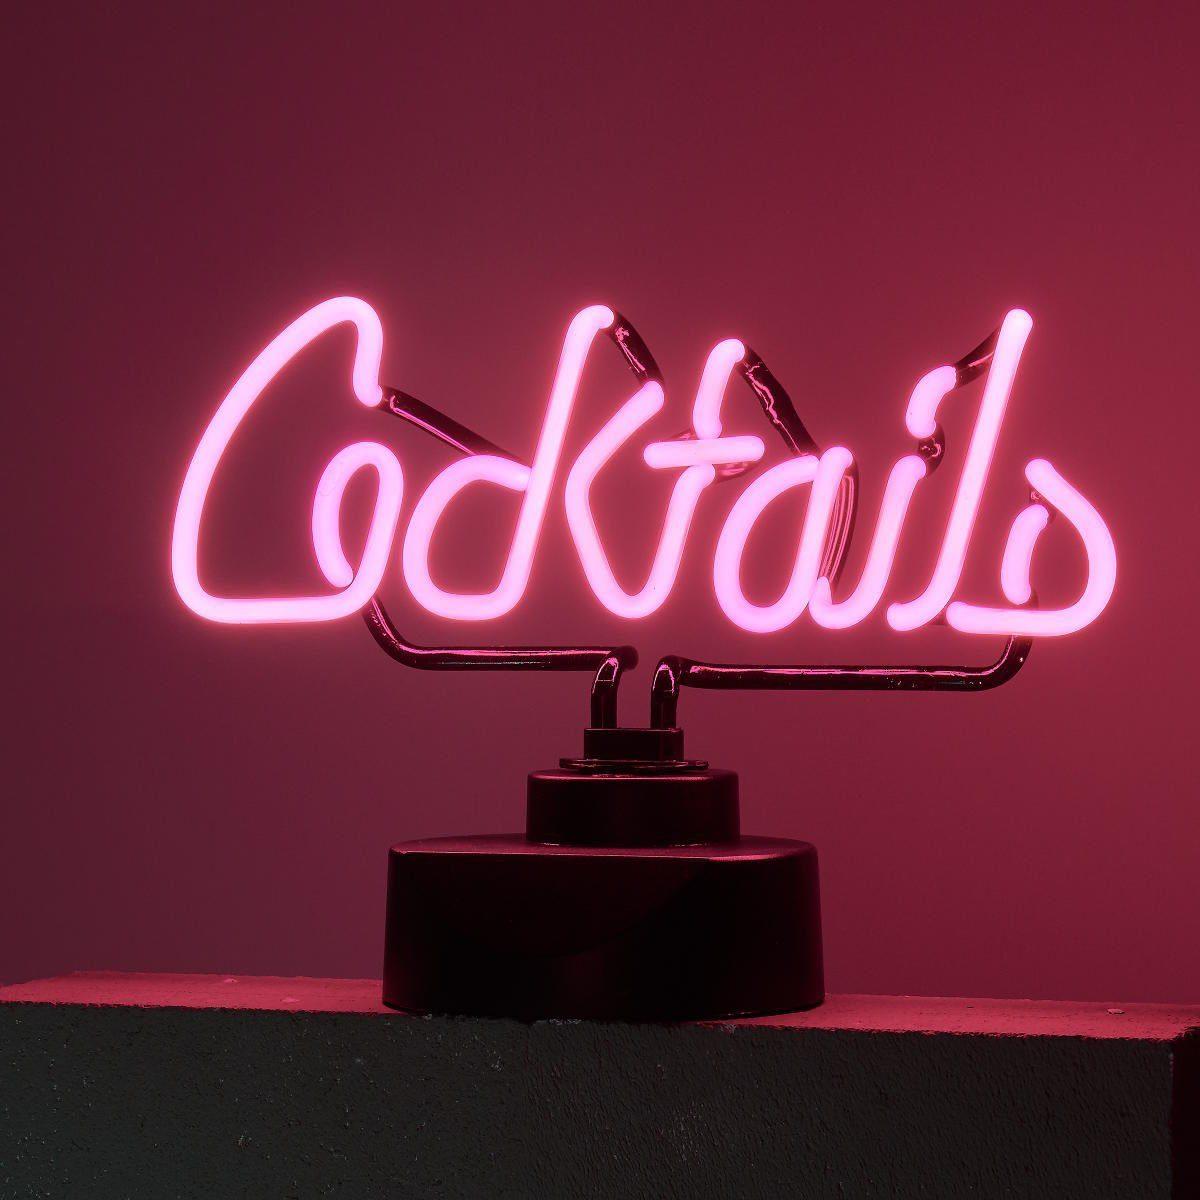 BUTLERS COCKTAILS »Neon-Leuchte Cocktails«